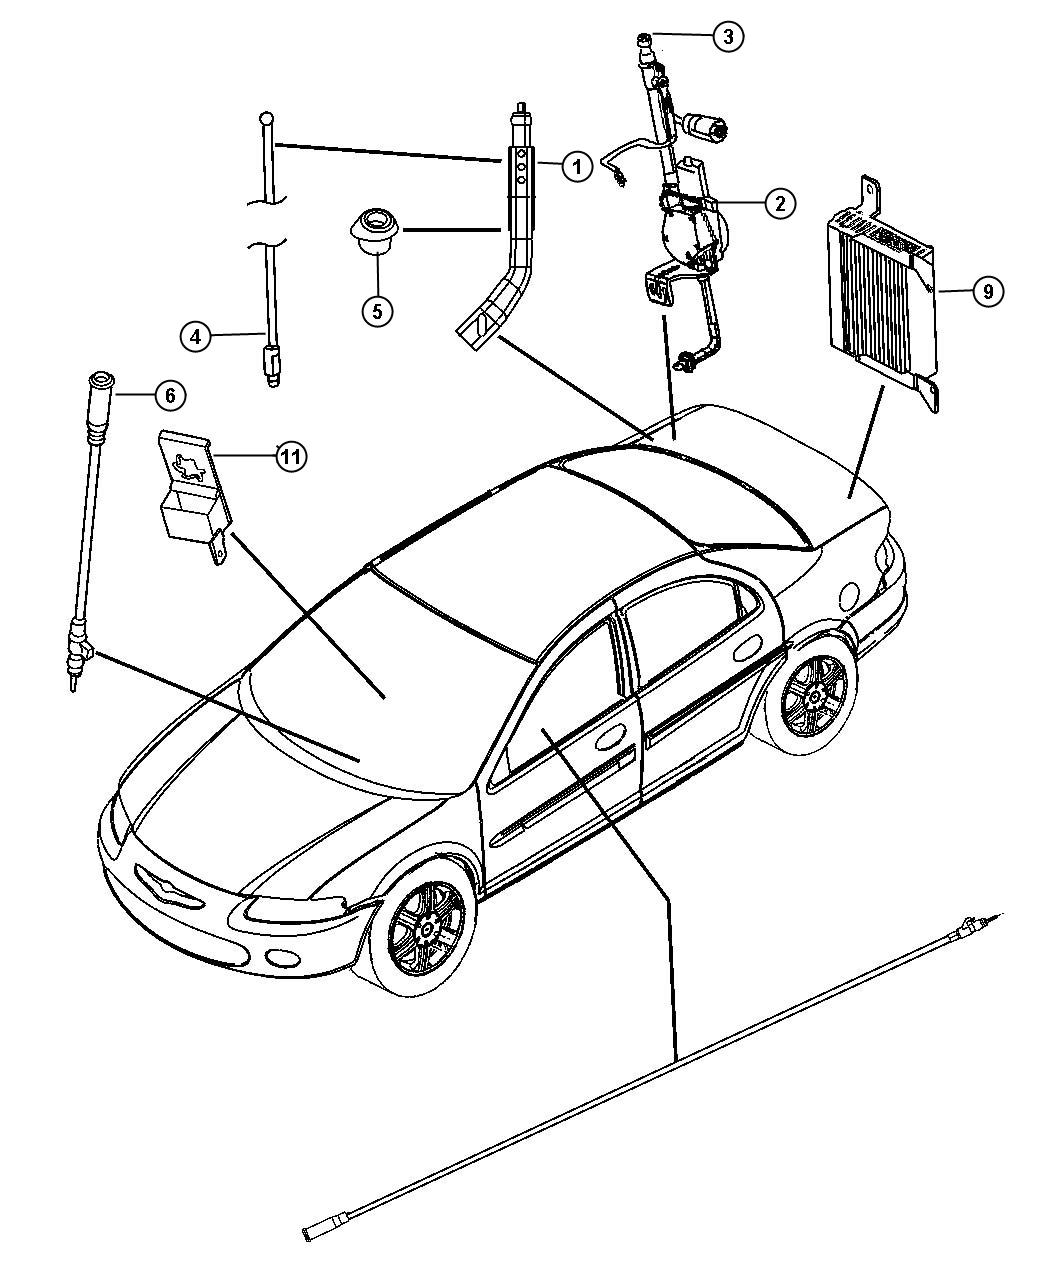 Chrysler Sebring Antenna. [[fixed long mast antenna, rear